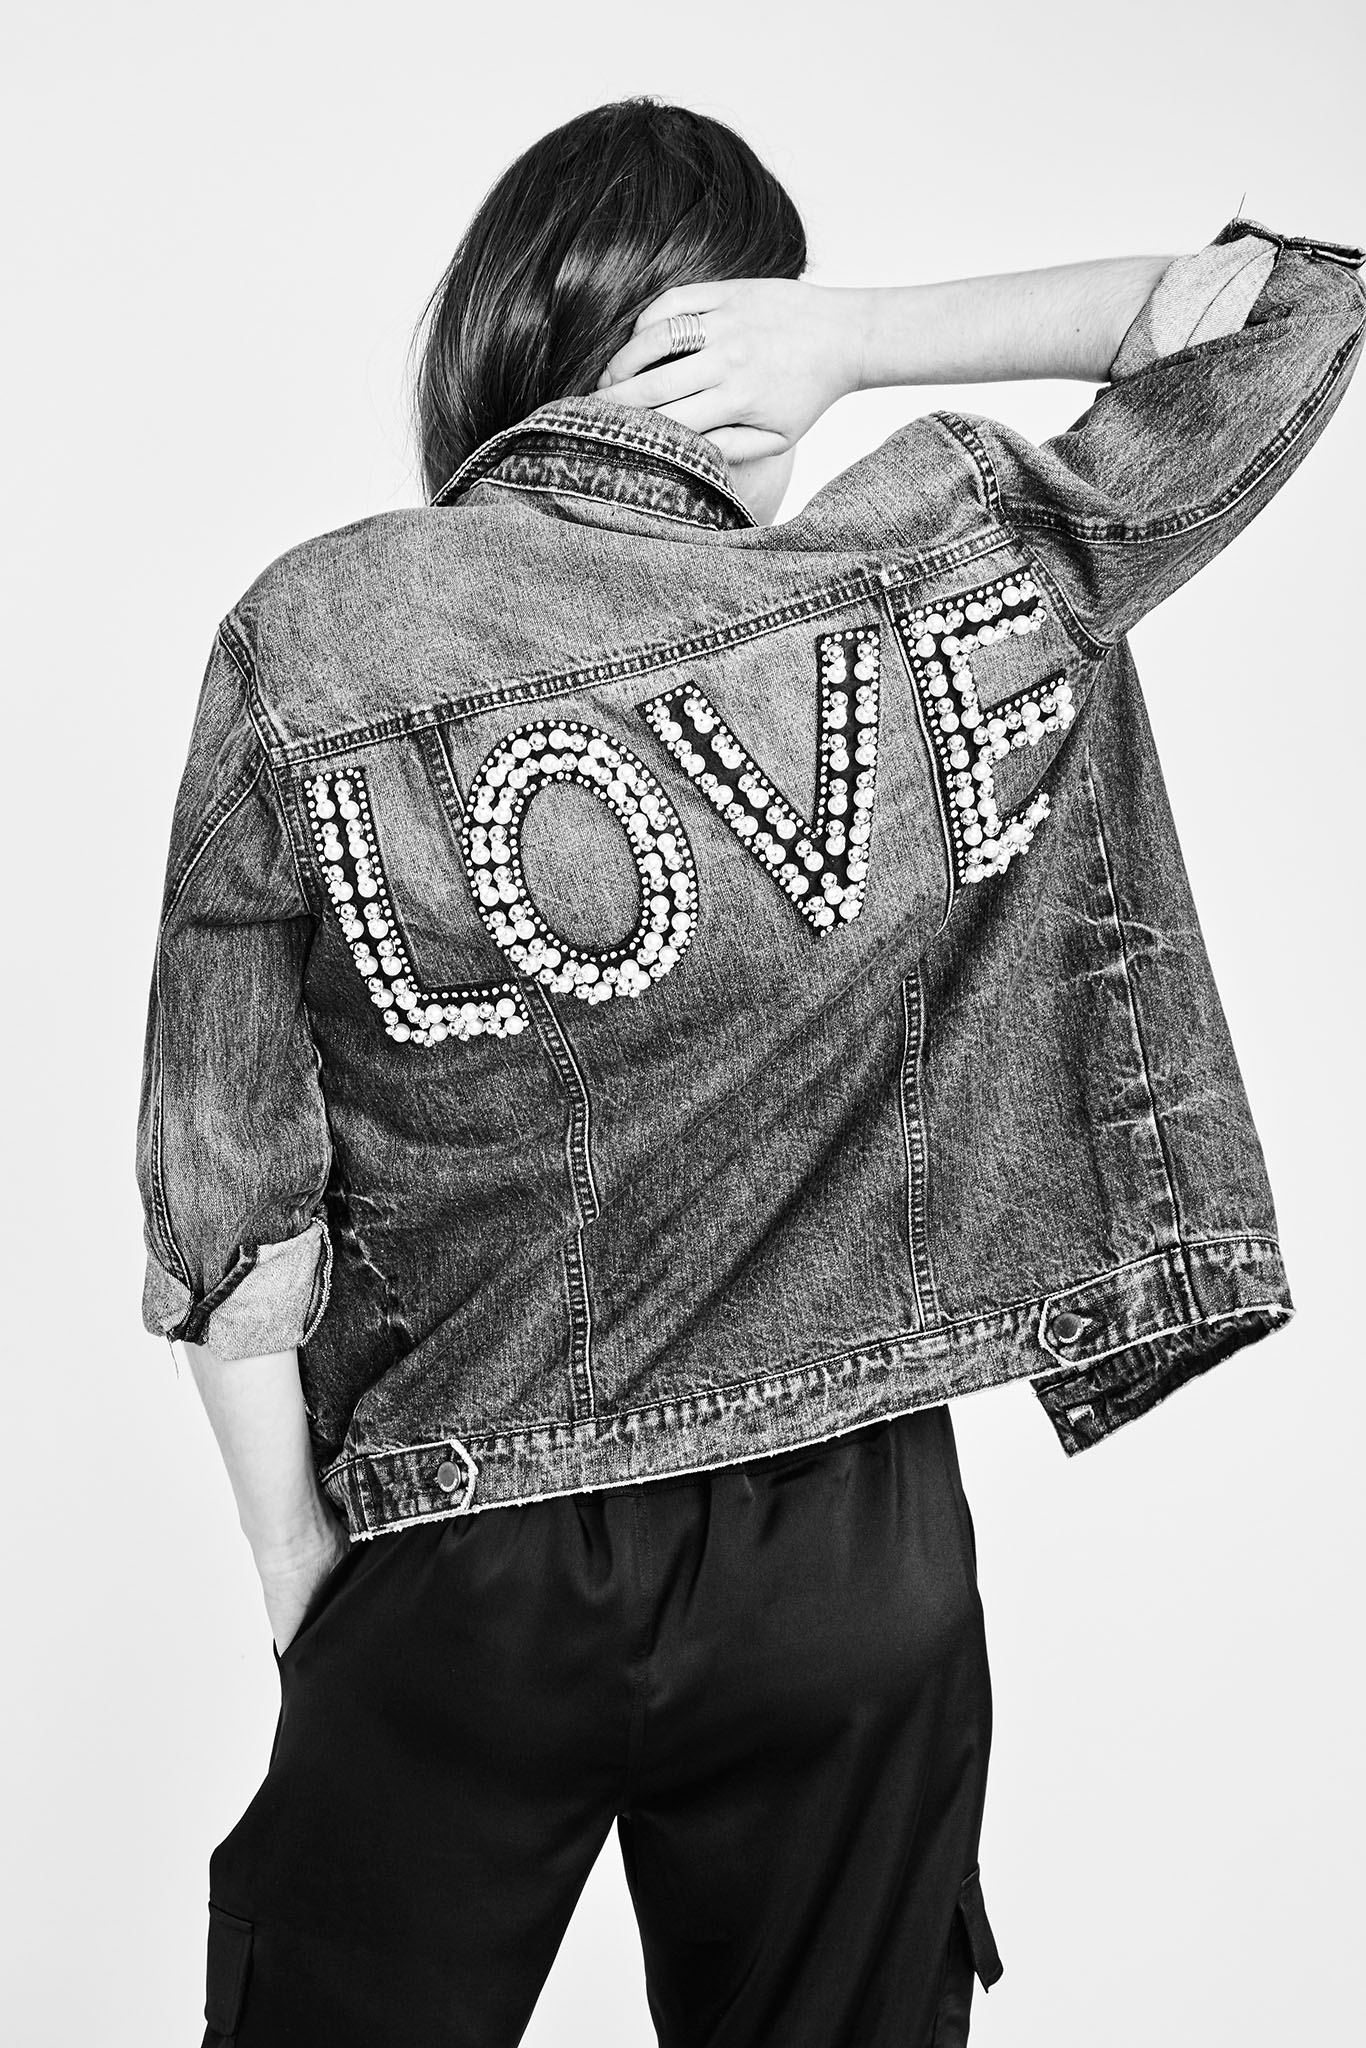 A look from Rachel Rachel Roy's Love capsule.